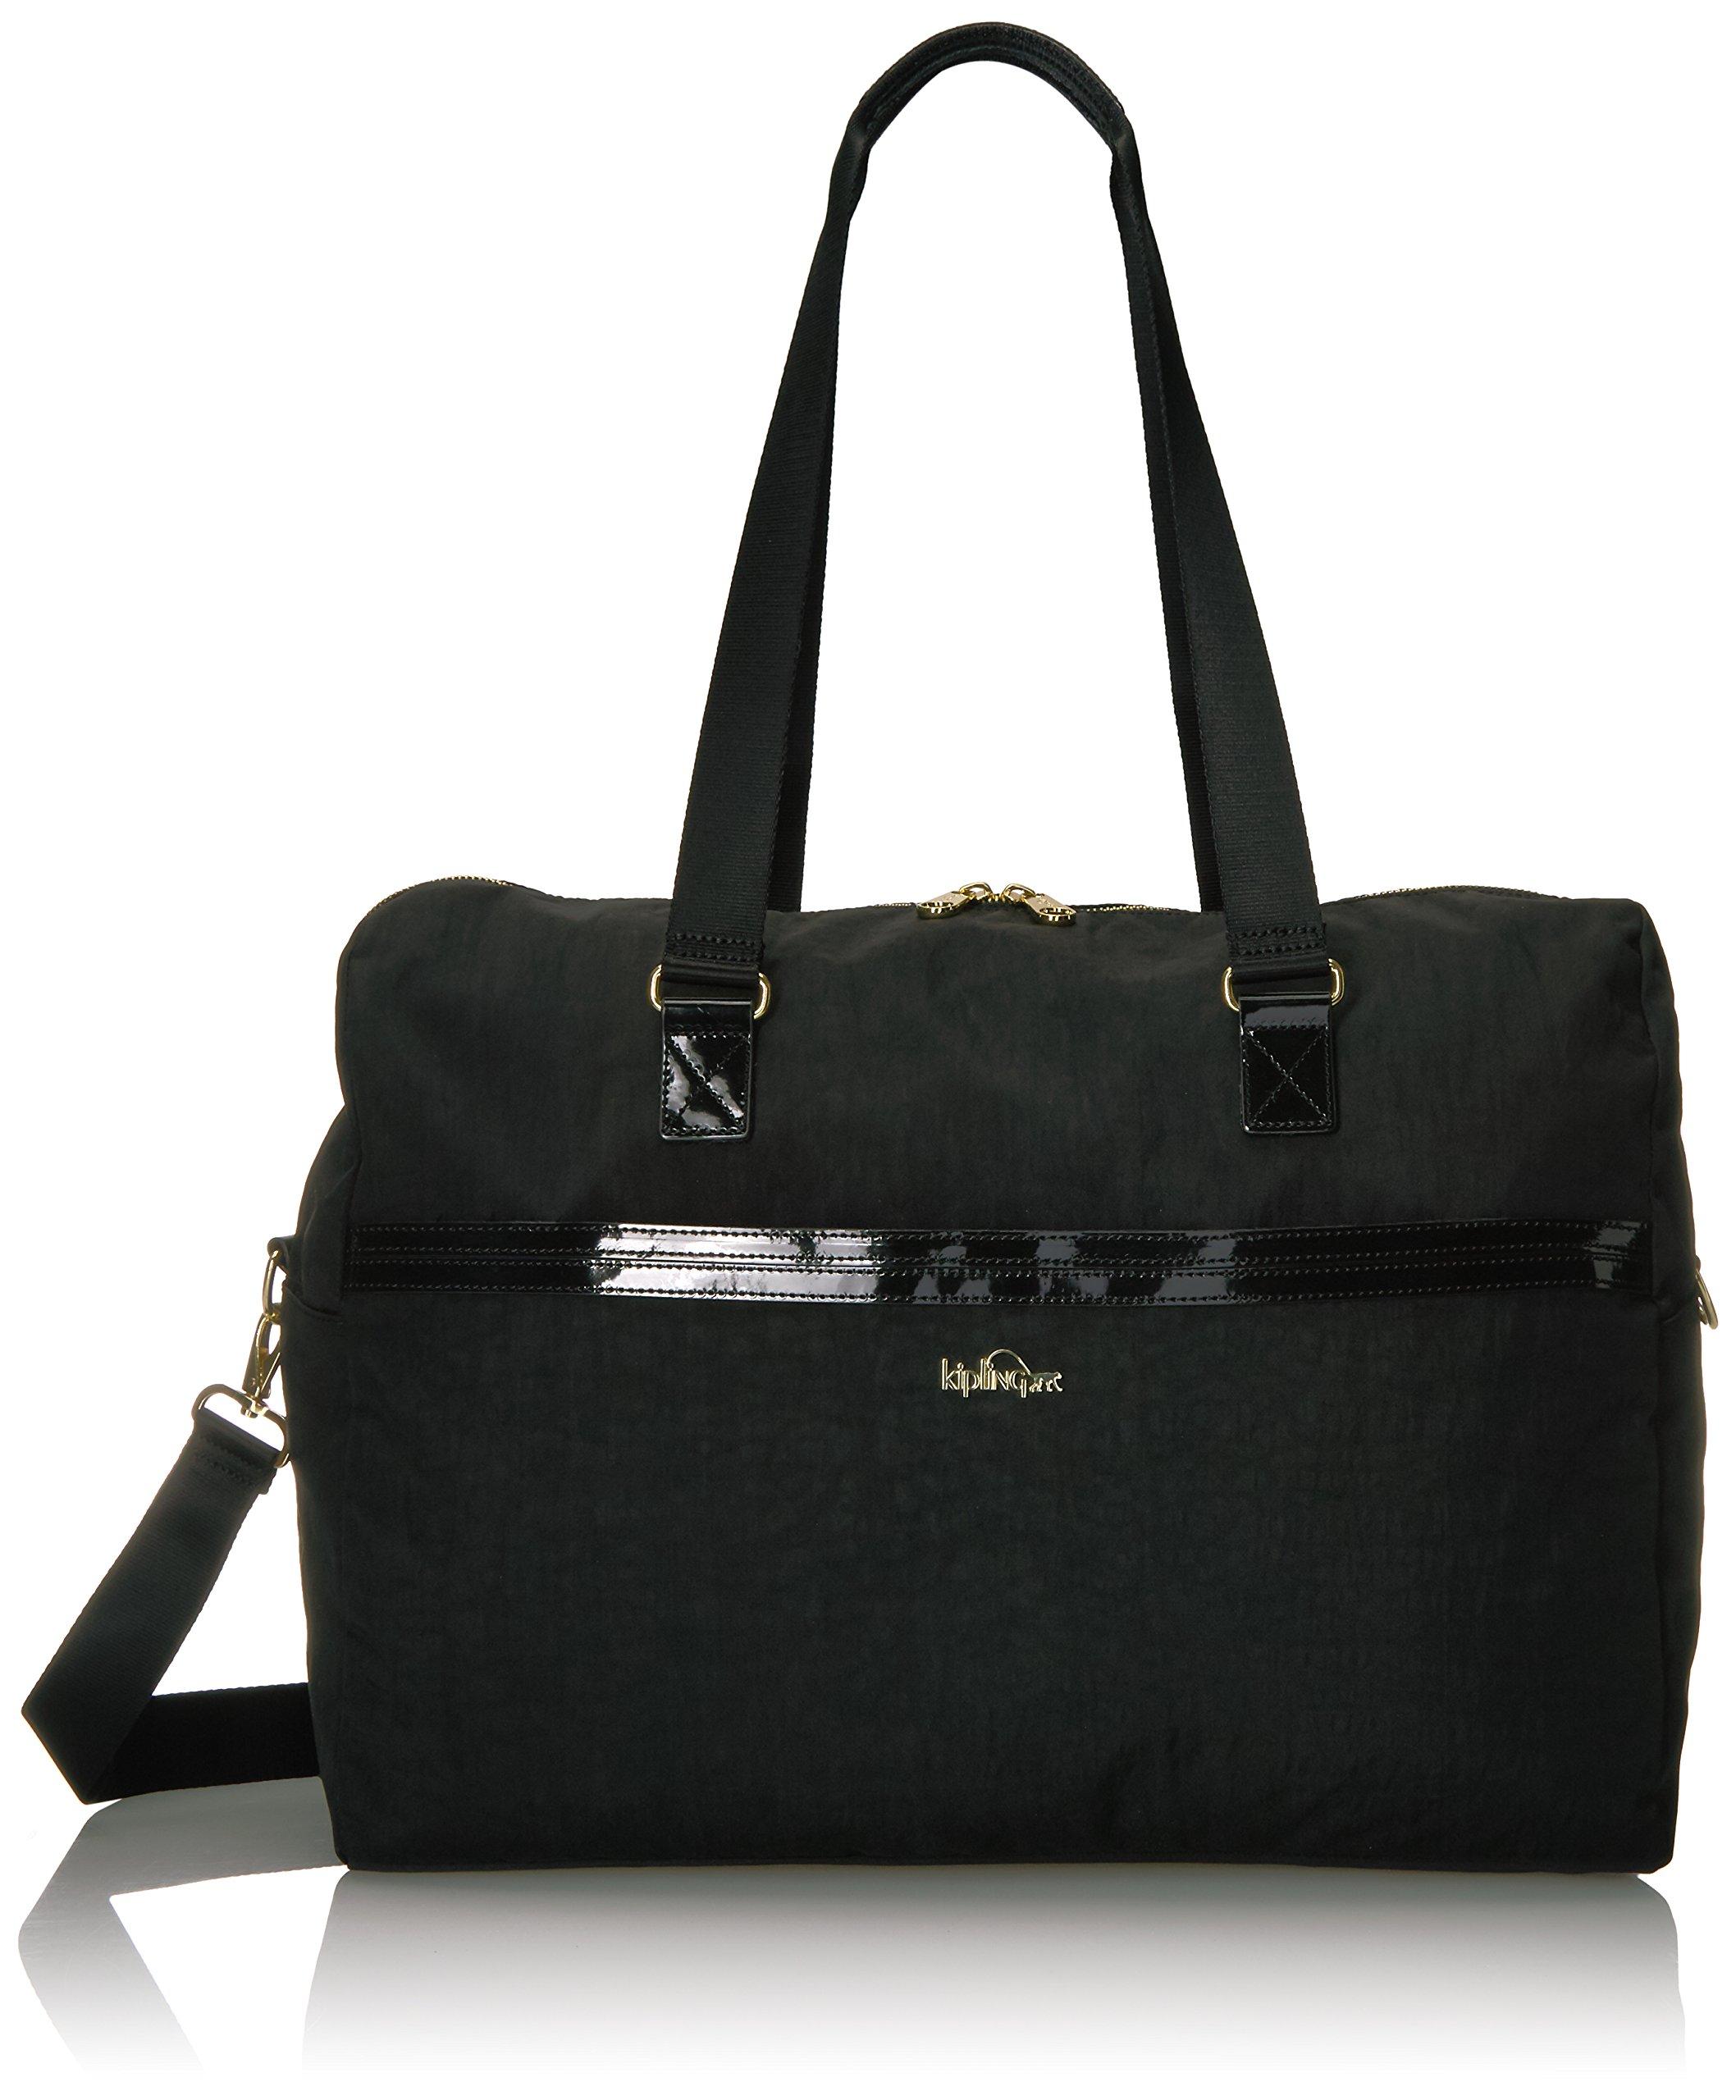 Kipling Women's Sasso Large Duffle Bag, Black Patent Combo by Kipling